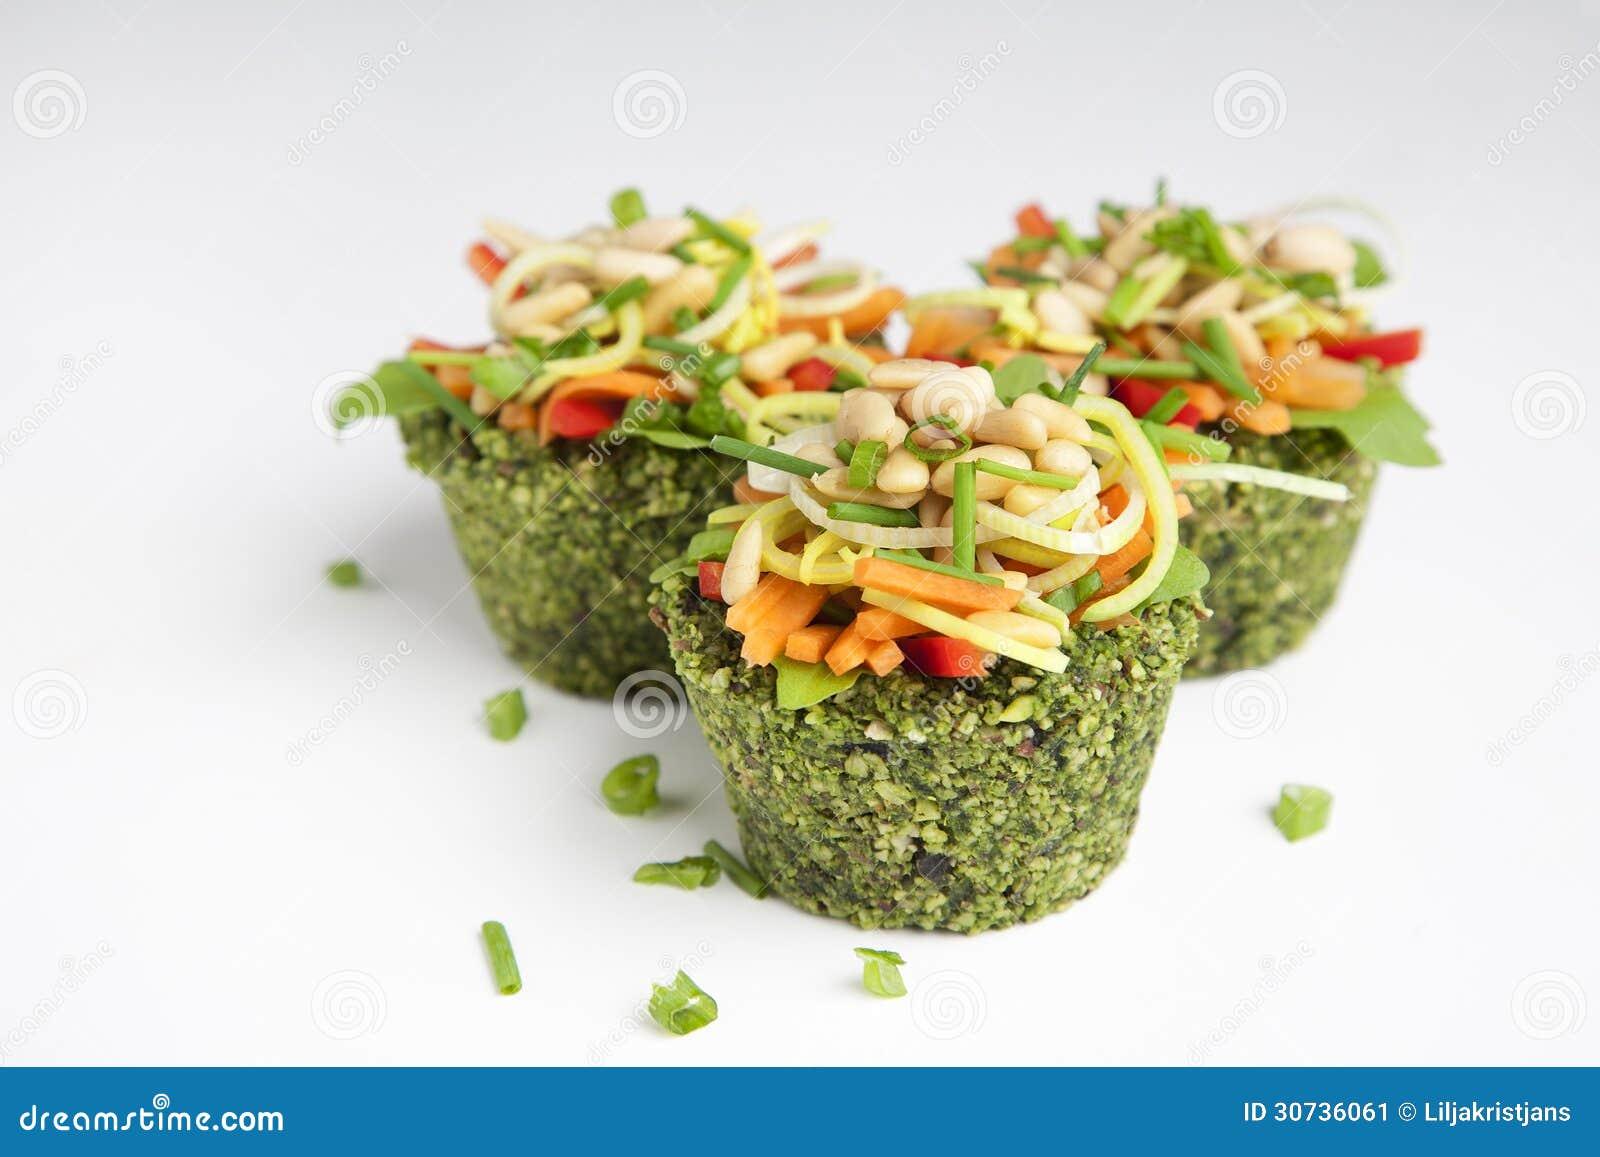 Raw Food - Cupcakes Stock Image - Image: 30736061